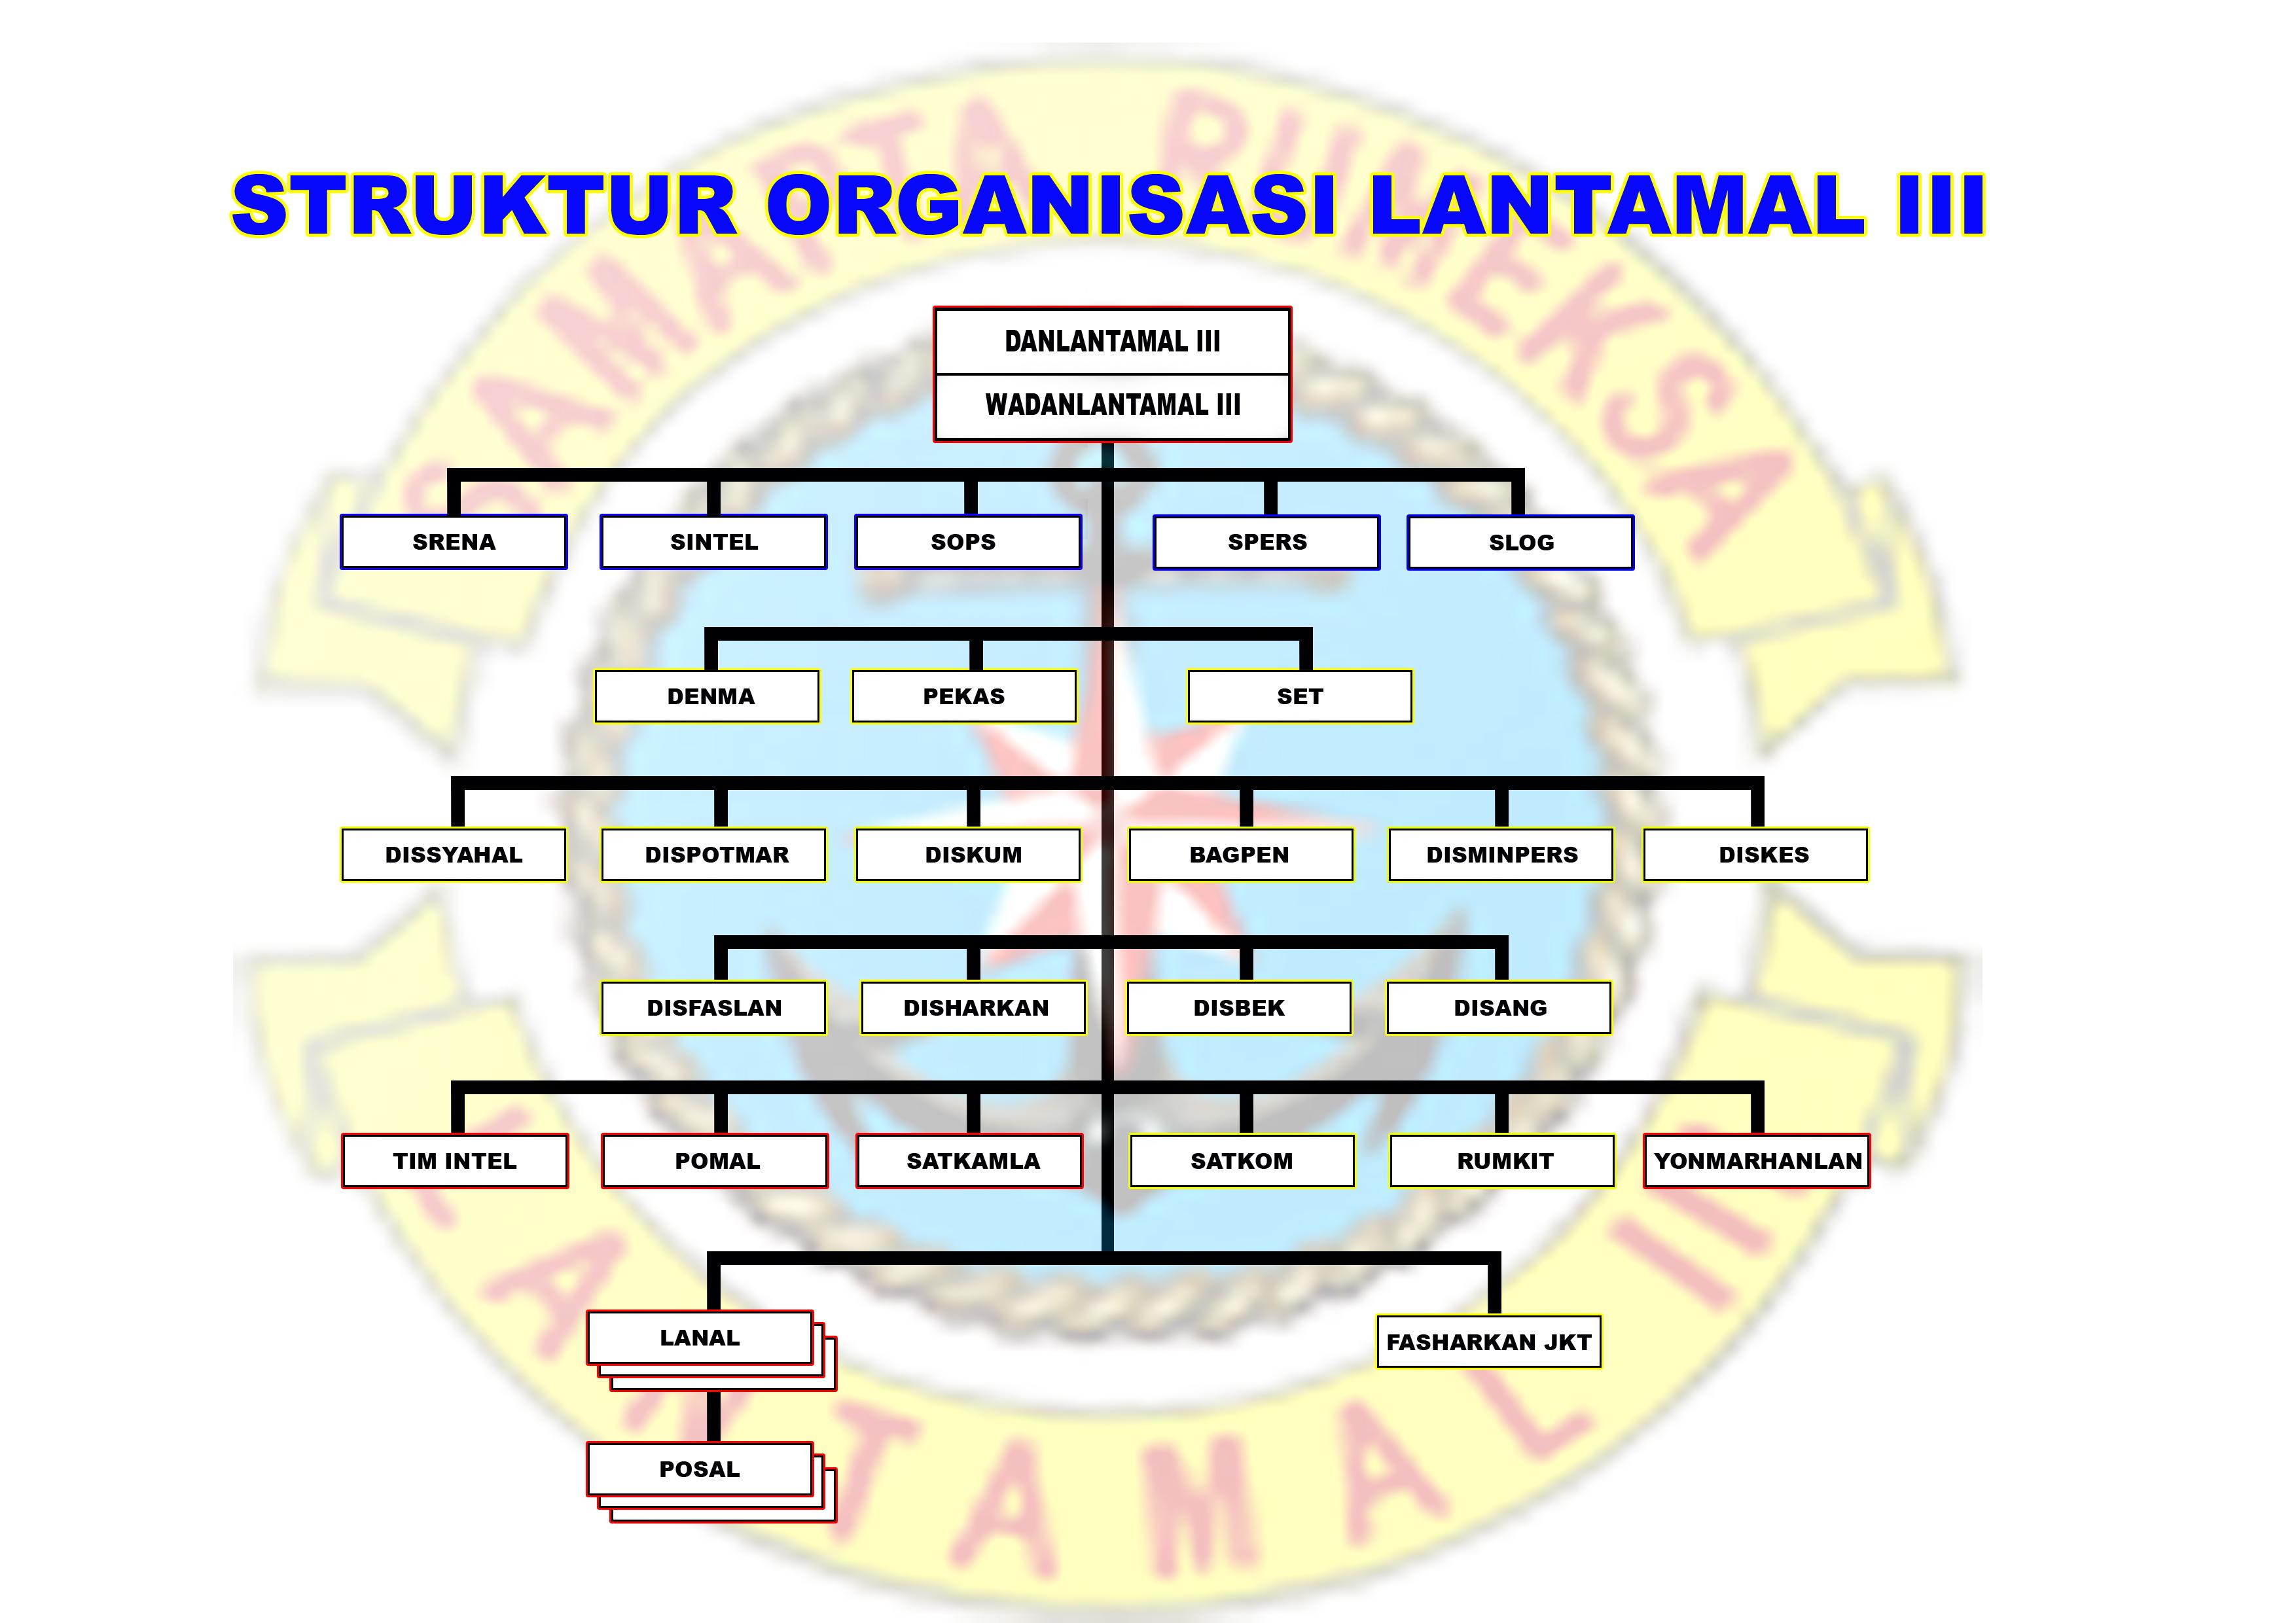 struktur lantamal 3 ancol \u2013 avianvega Struktur Organisasi PT struktur lantamal 3 ancol